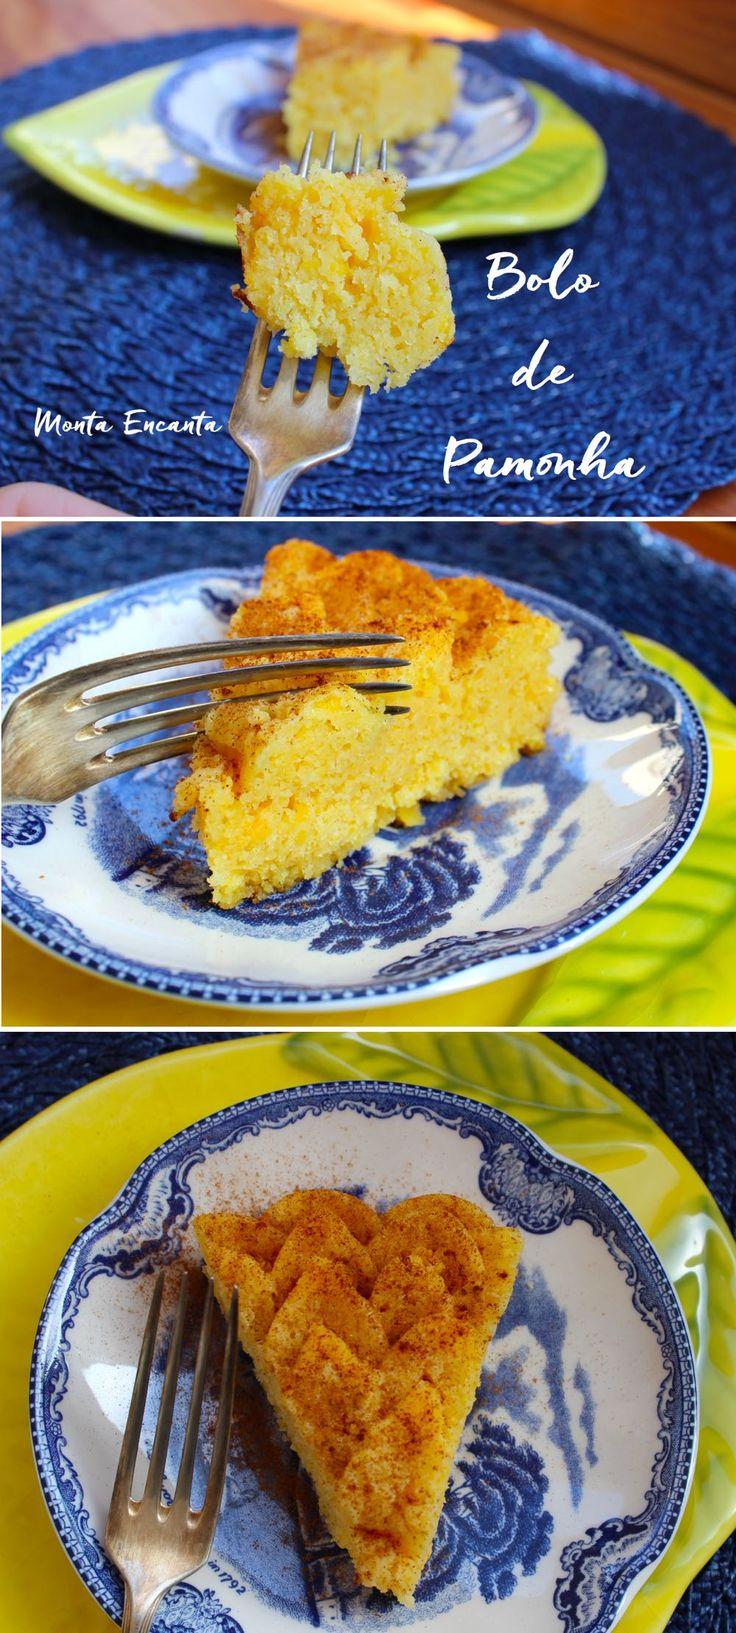 Bolo de Pamonha, é de lamber os beiços. Bolo de Pamonha, como nome diz lembra pamonha, meio bolo, tipo pudim. Pamonha de Forno! Delicioso para comer ainda quente e de …